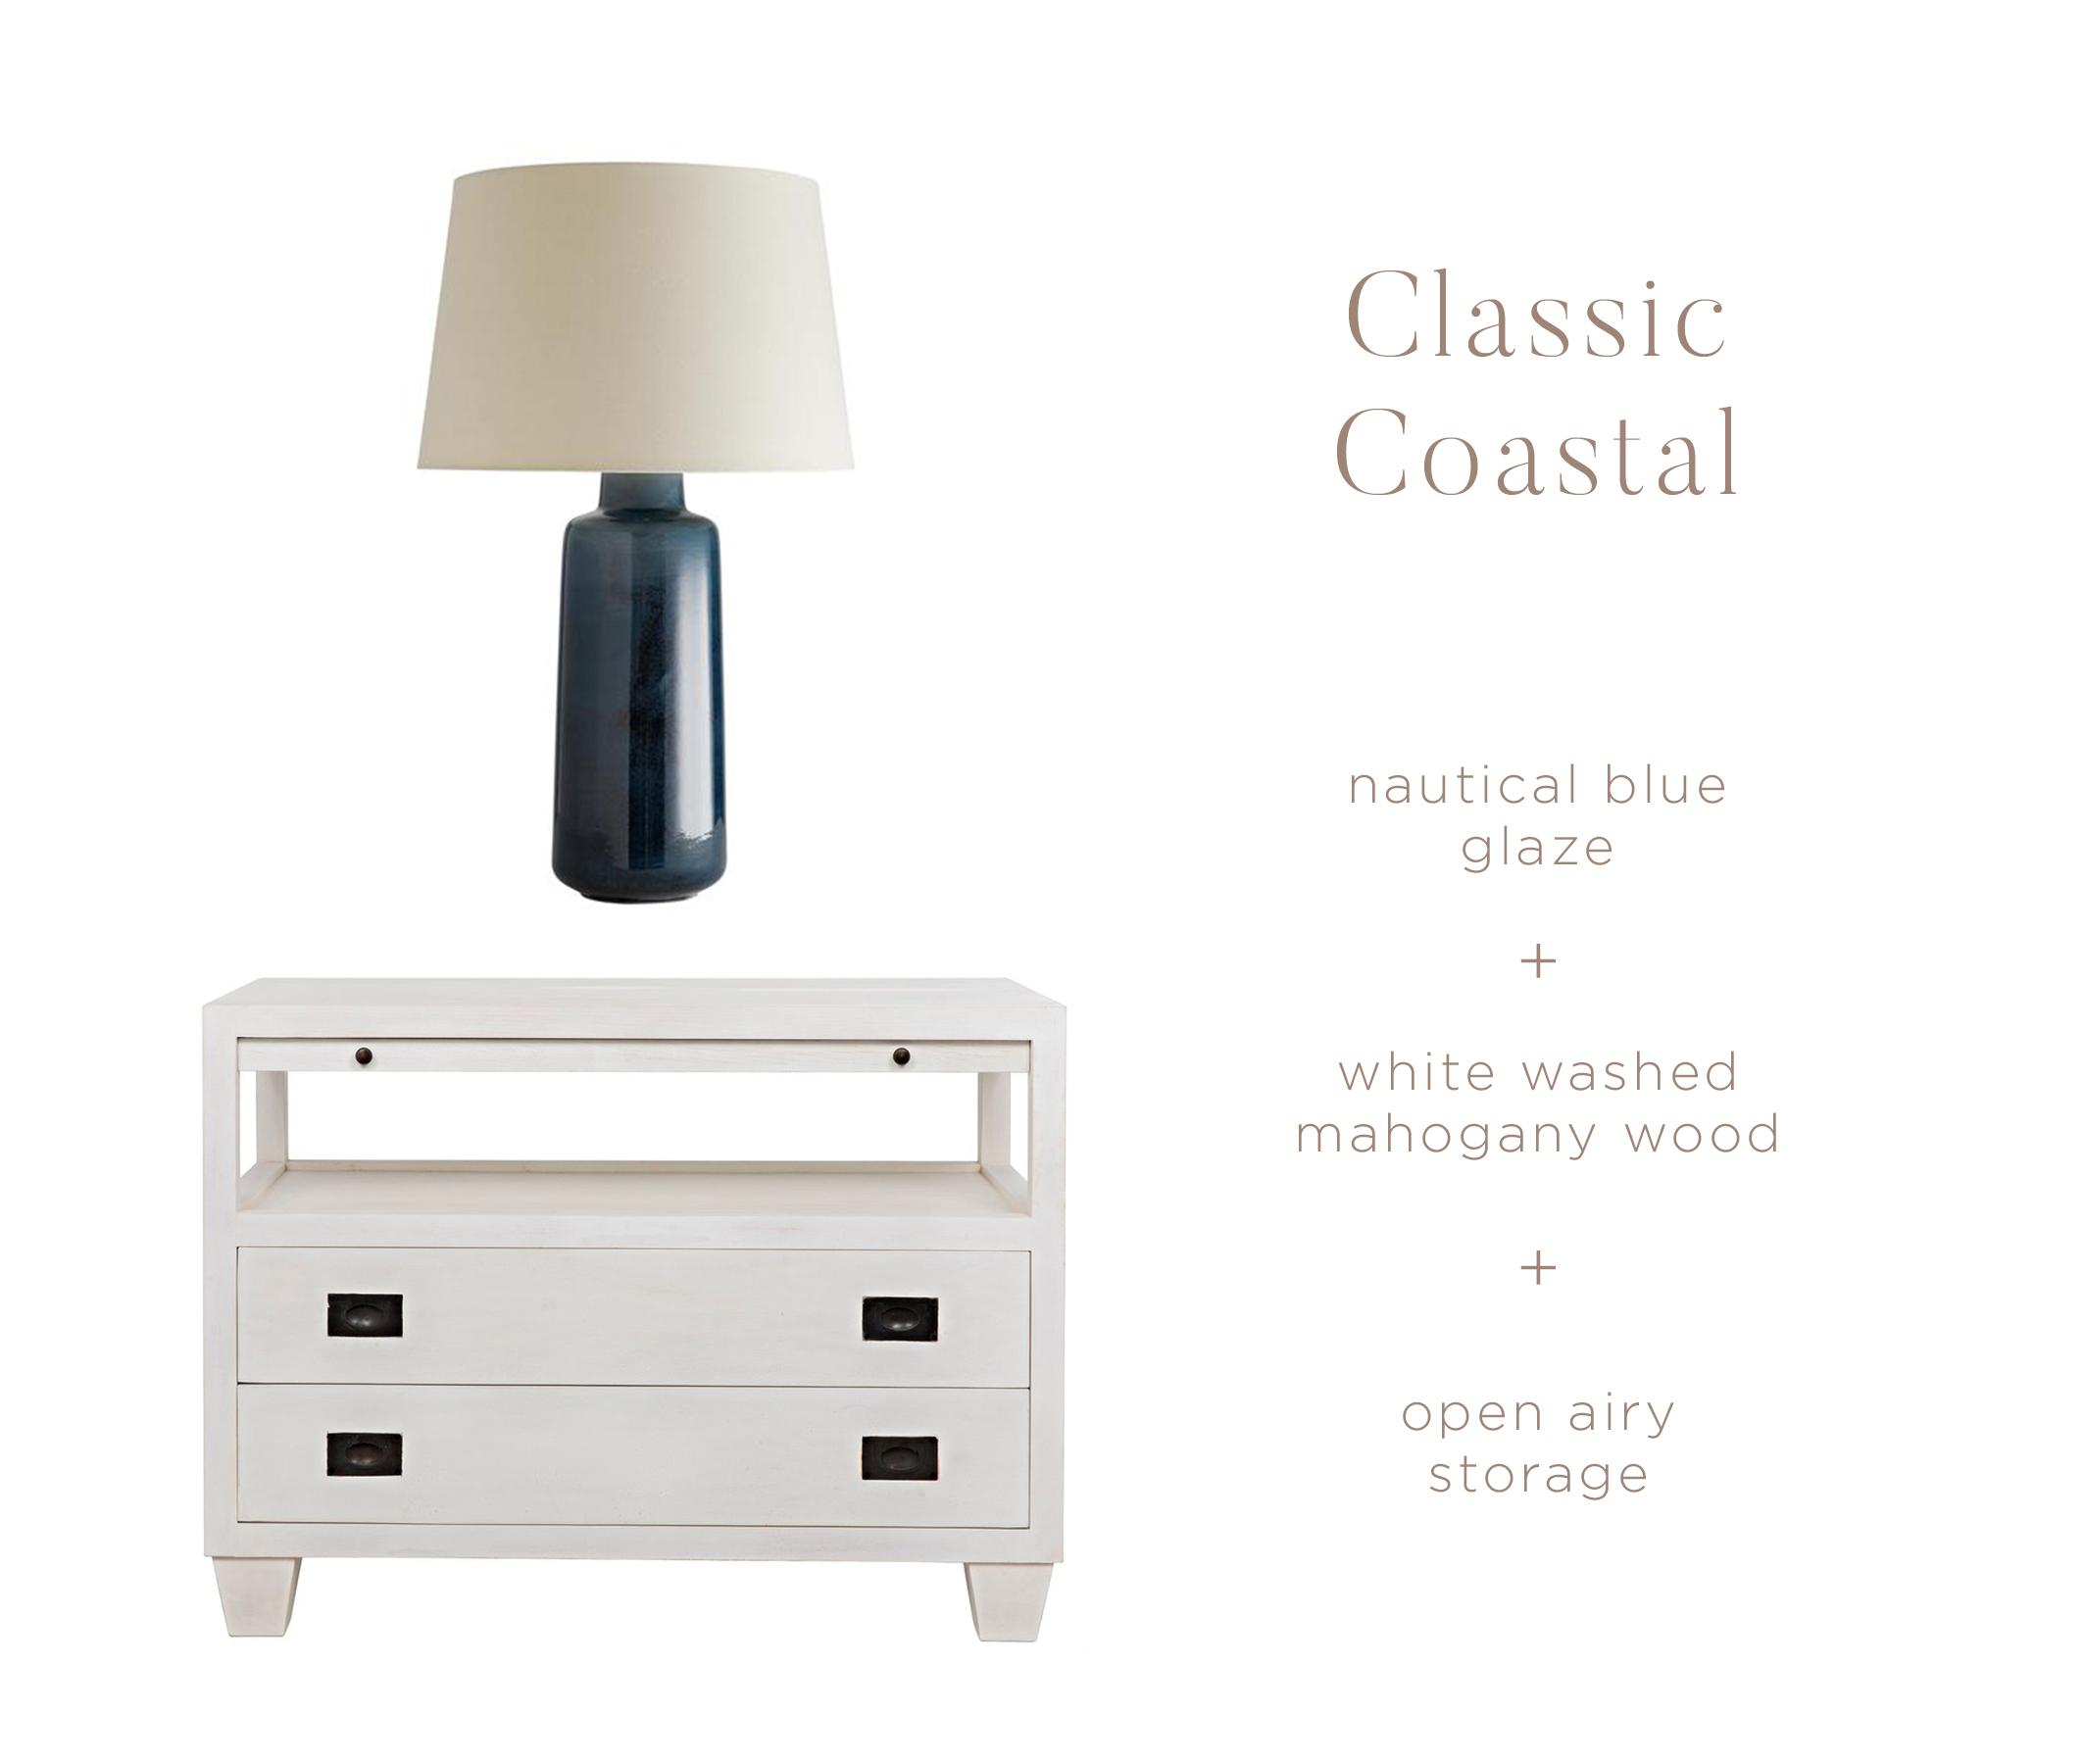 Shop the look:    Hyannis Table Lamp    |    Ken Side Table